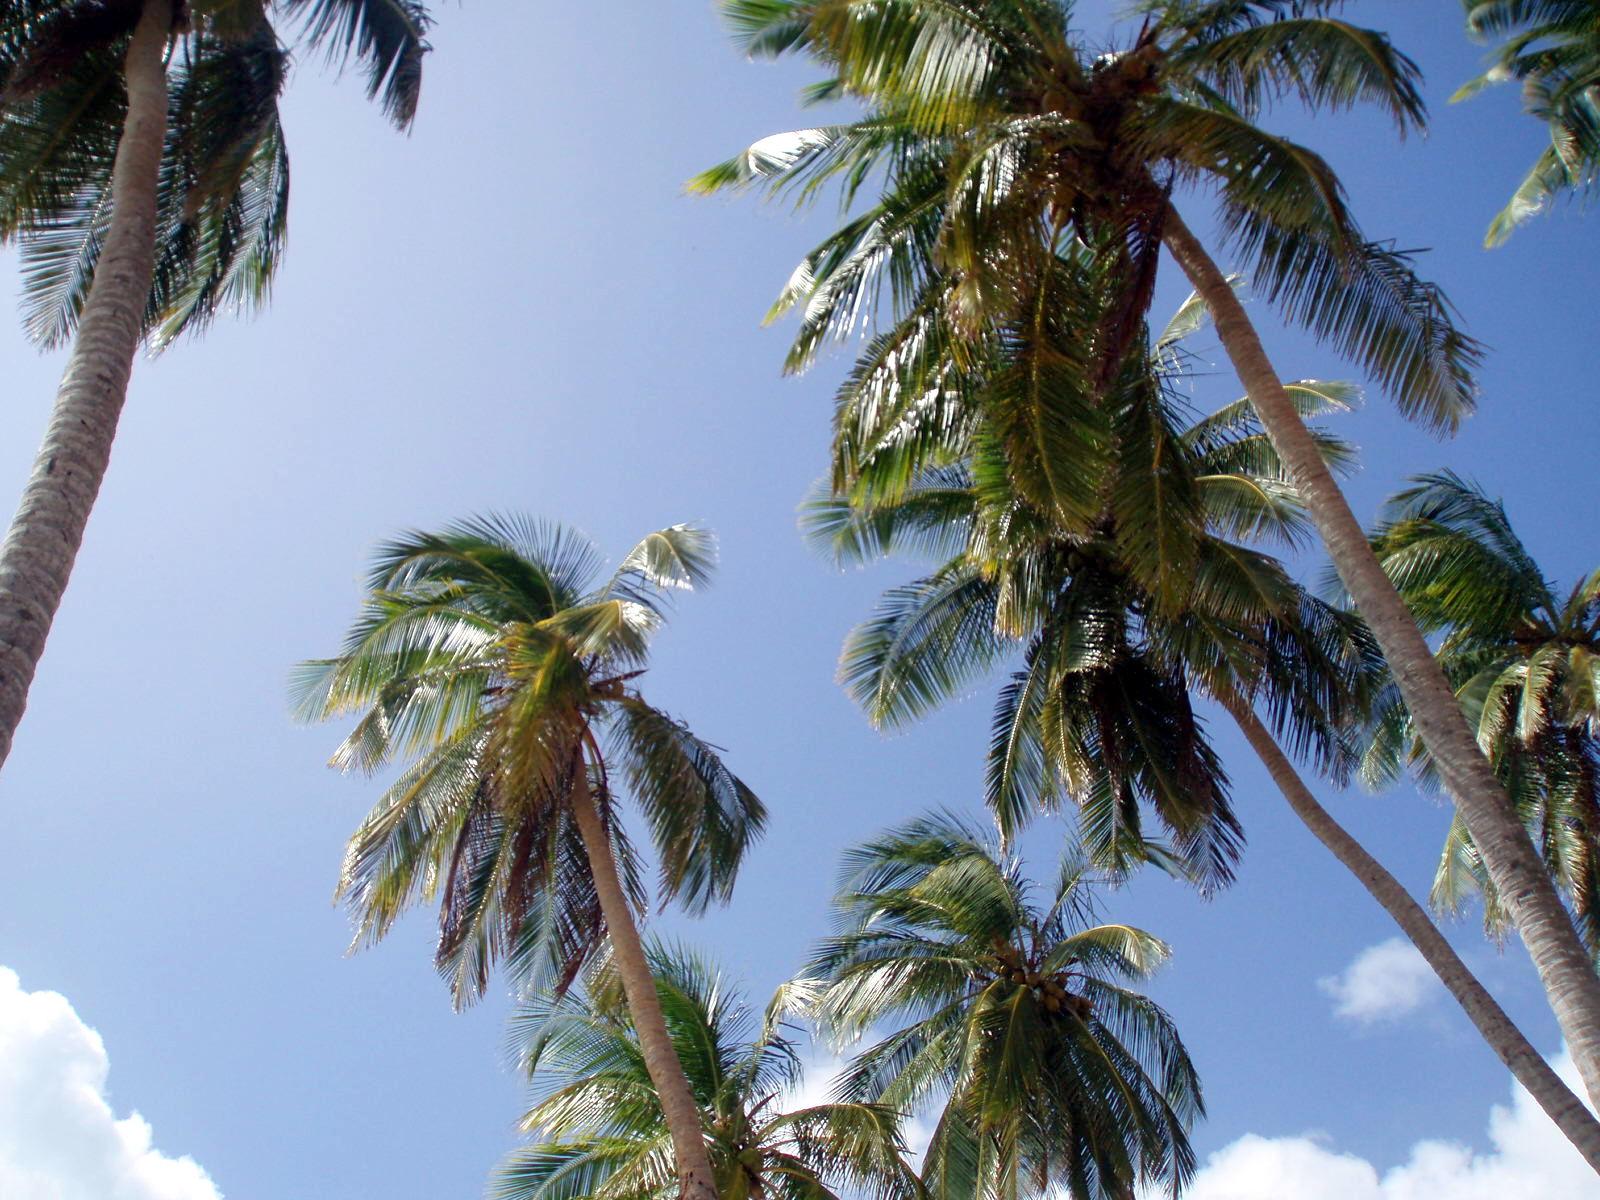 sanna_rosell_colombia_palms.JPG